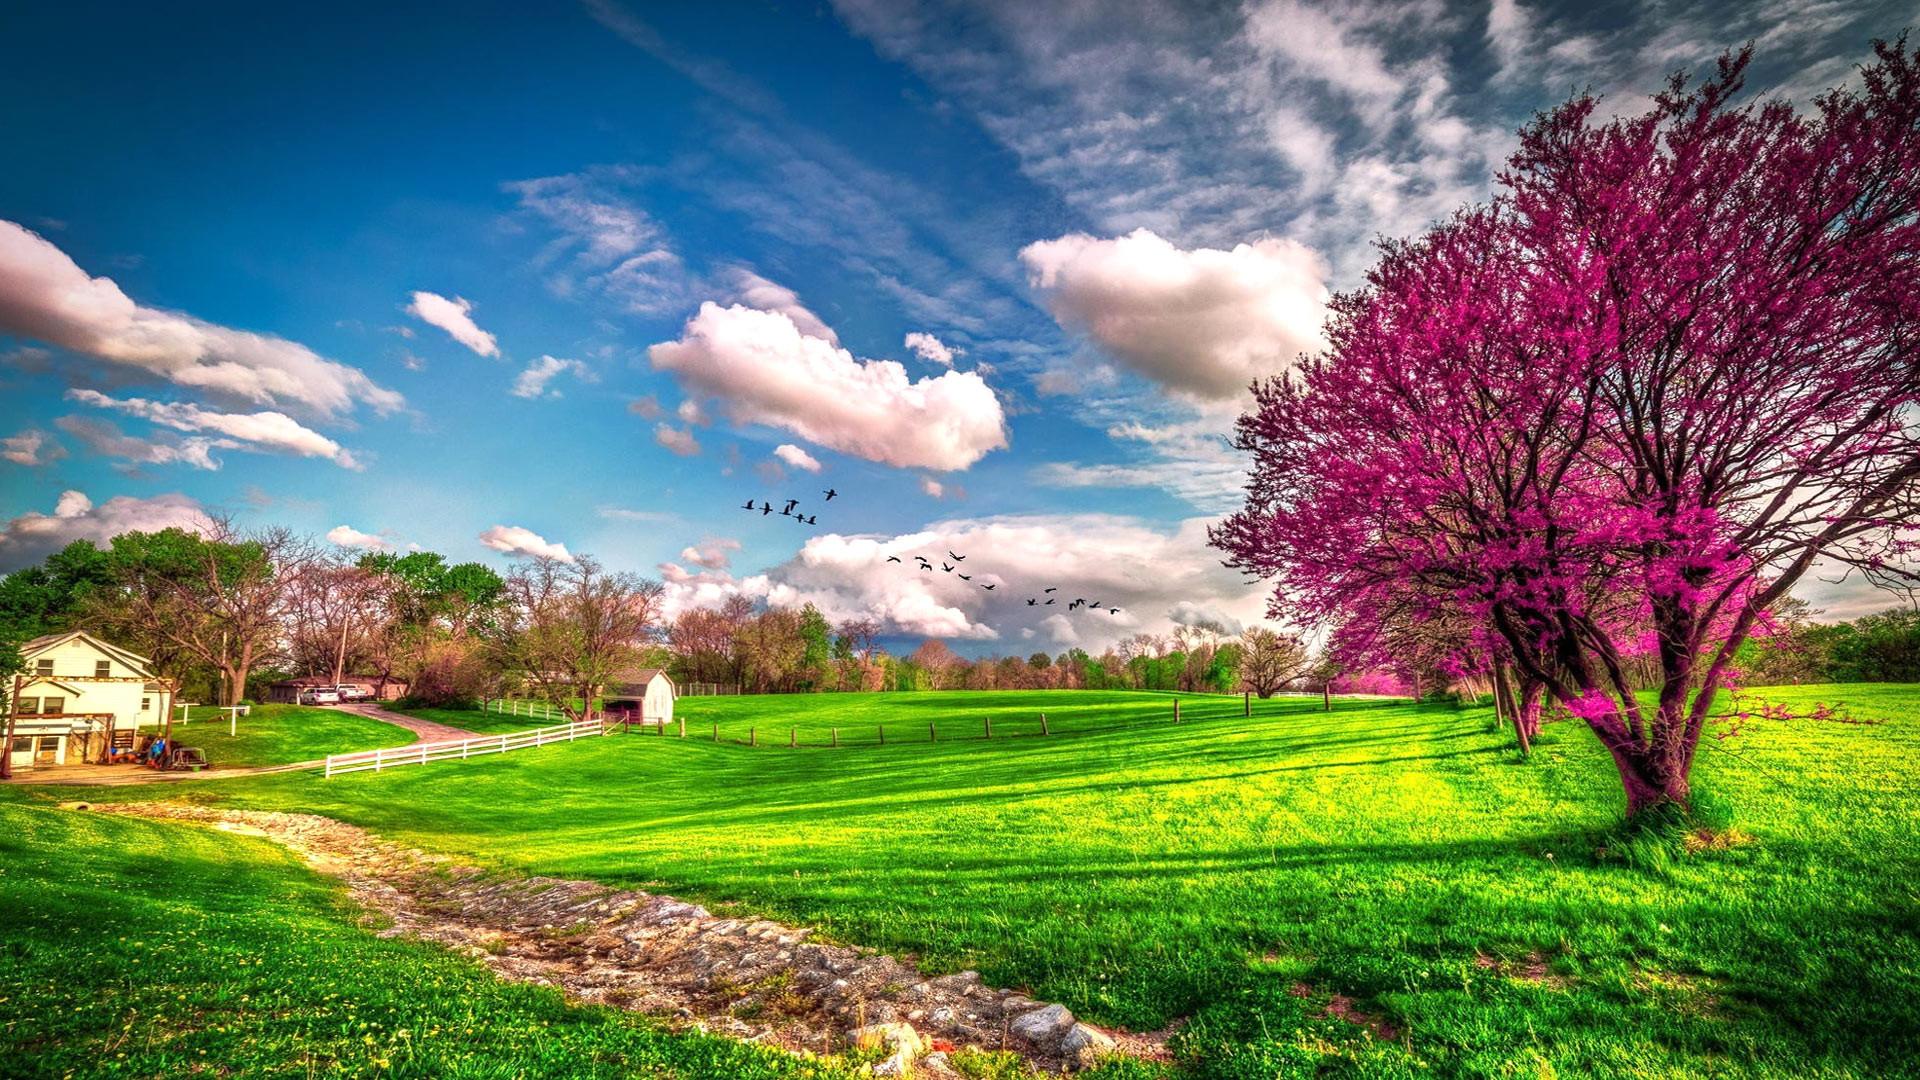 2560x1470 Beautiful Love Nature Wallpaper Hd Desktop Wallpapers